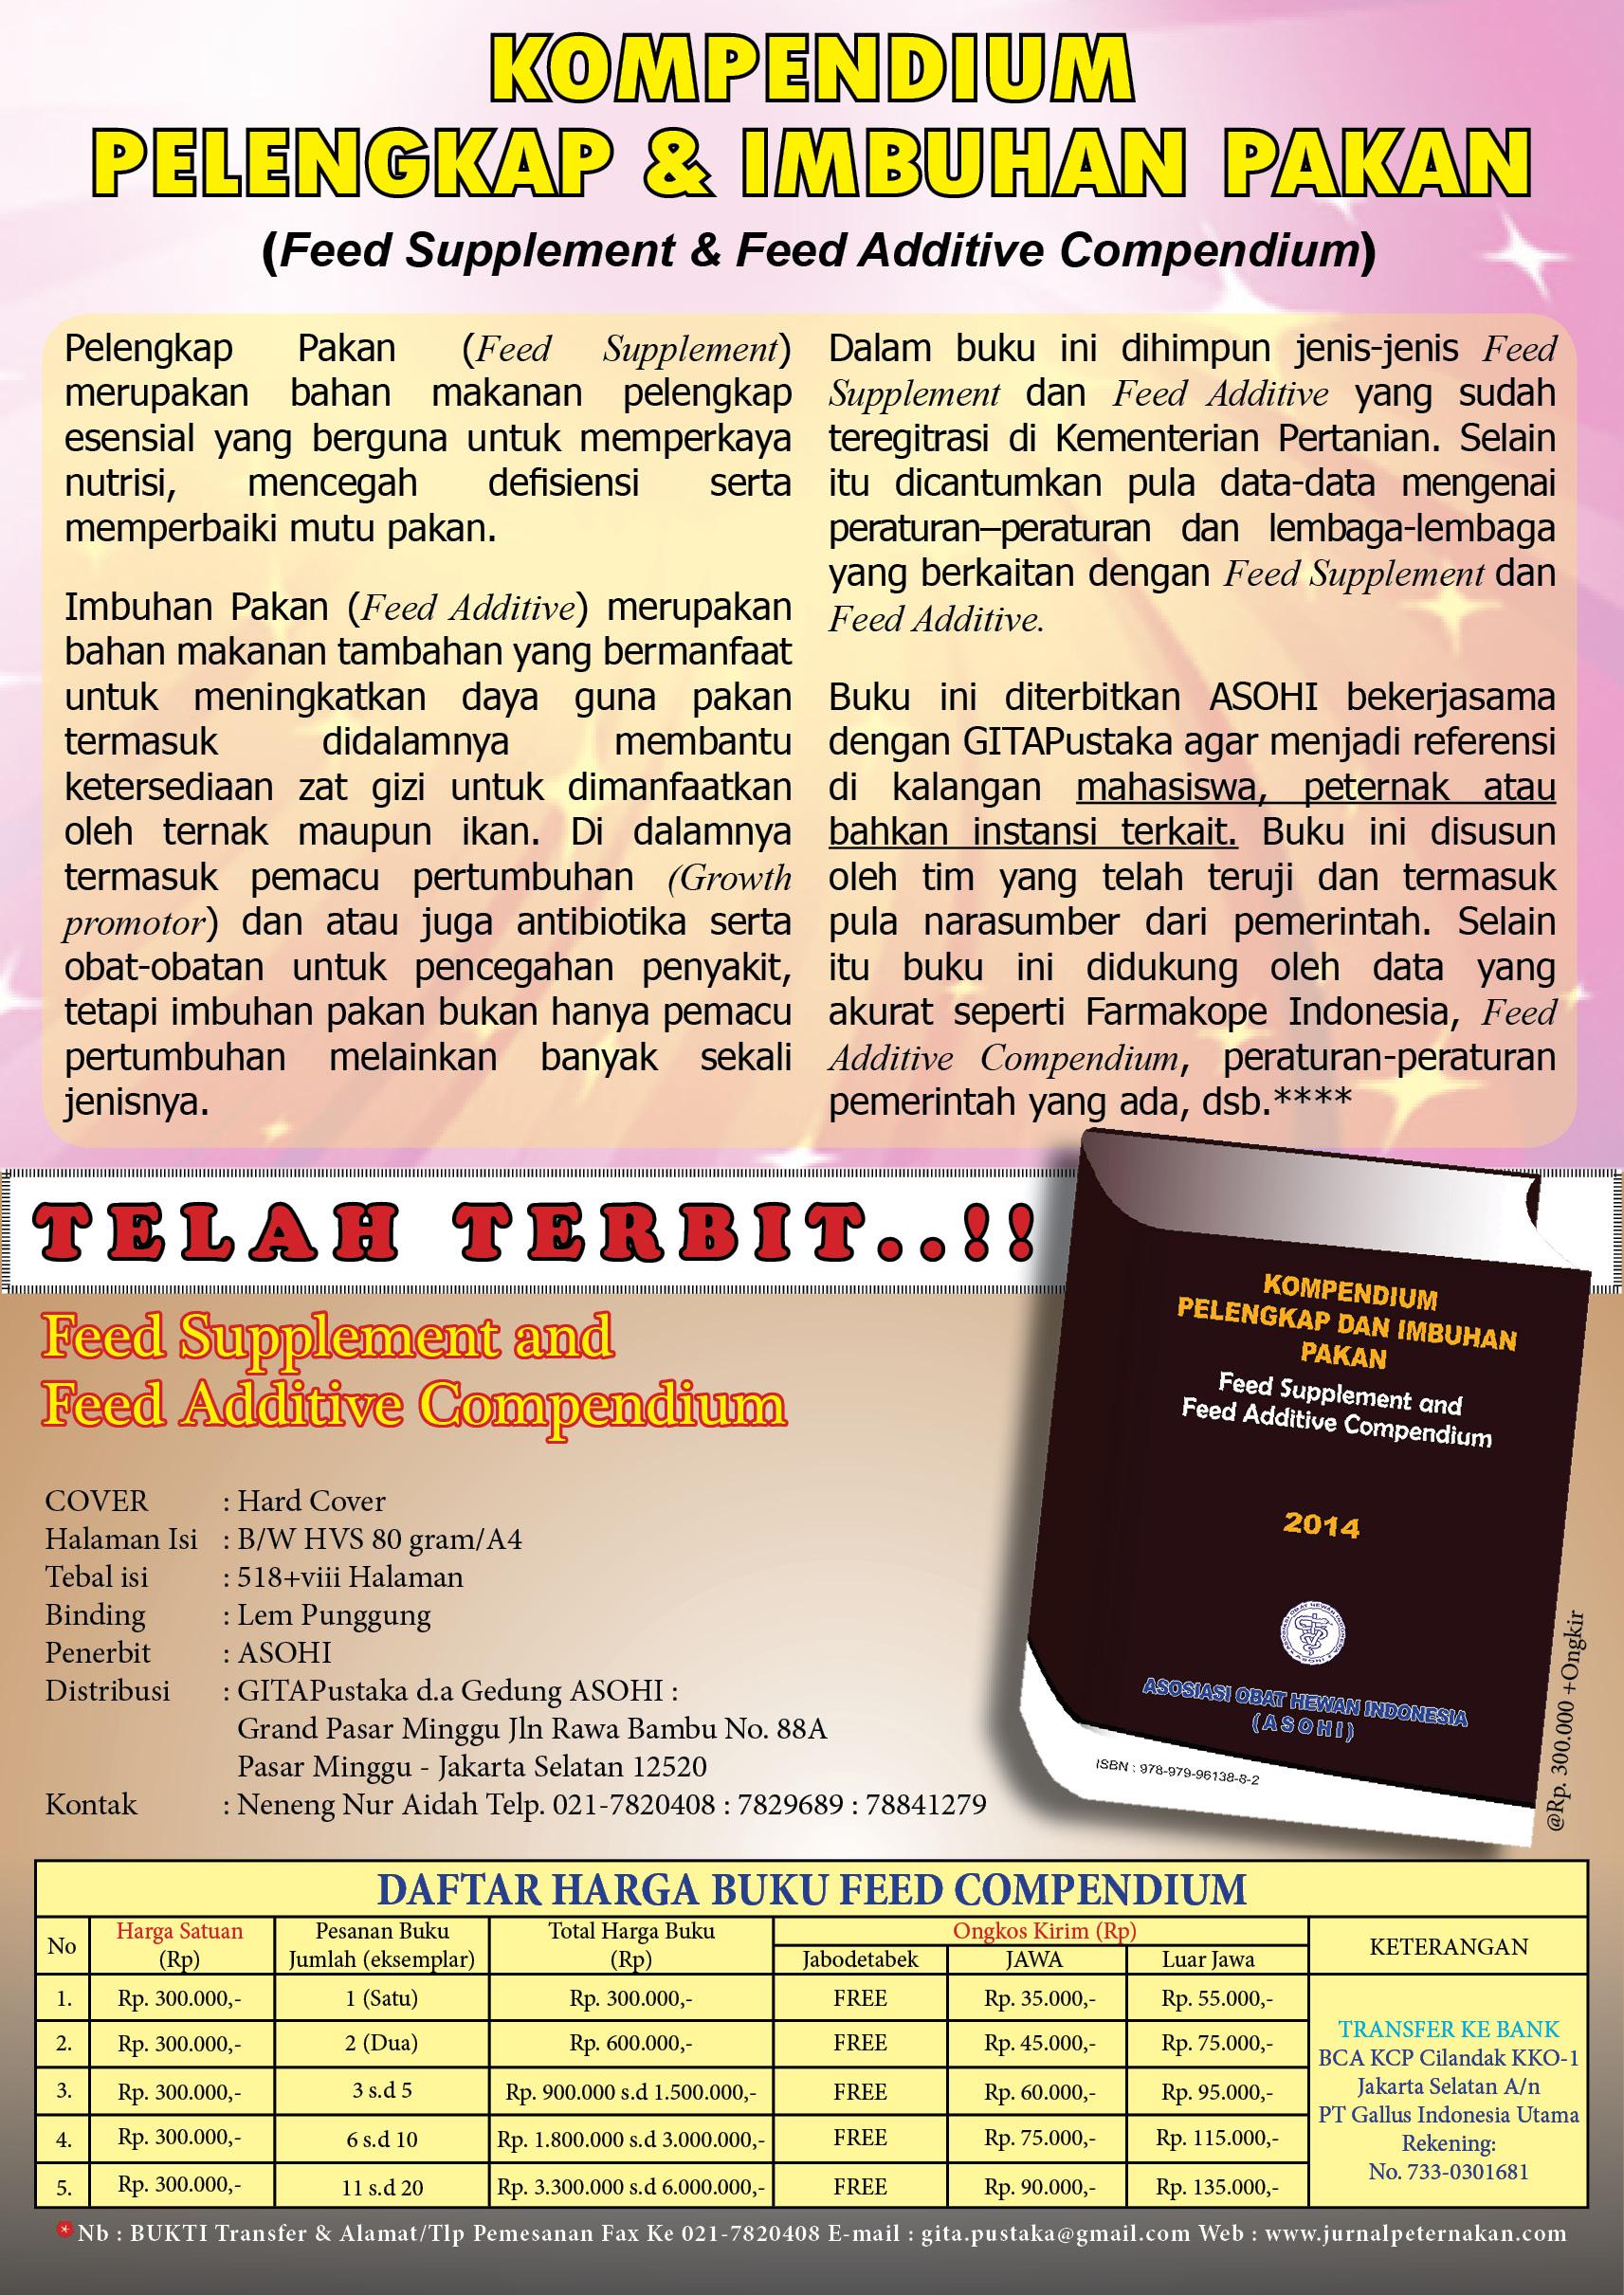 IKLAN BUKU FEED COM PENDIUM 2014